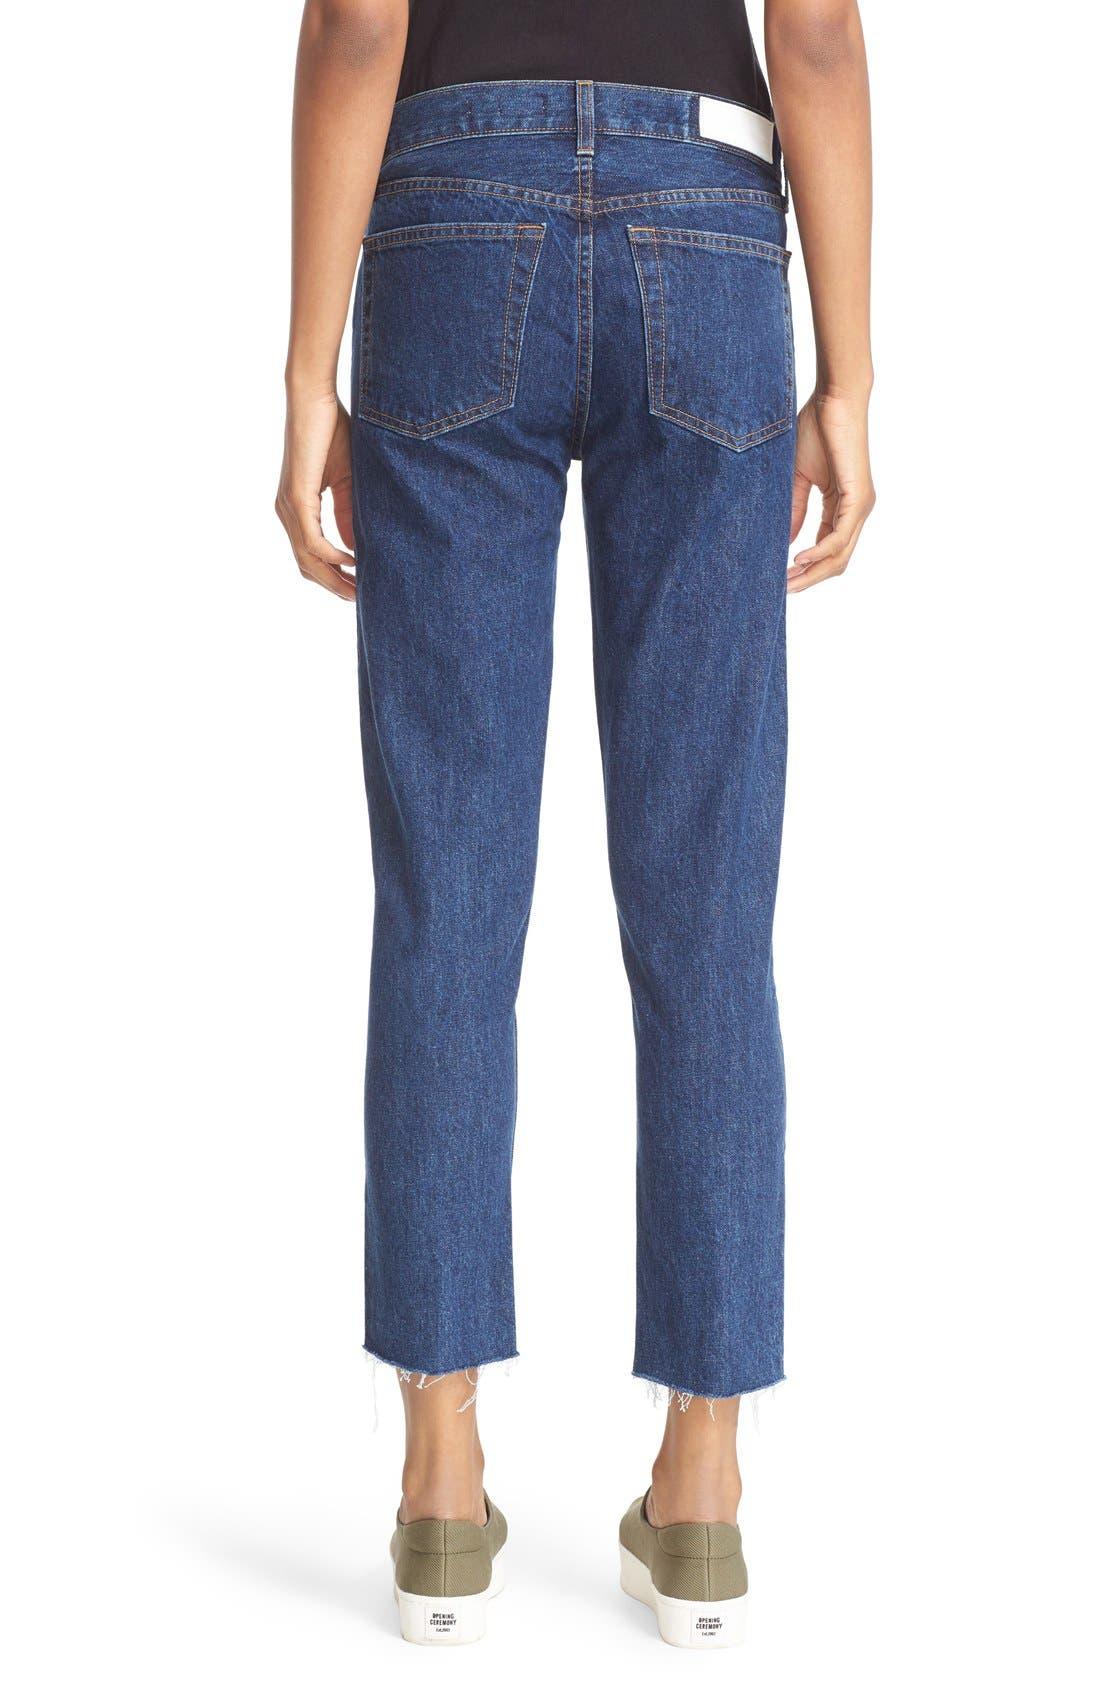 Originals High Waist Crop Jeans,                             Alternate thumbnail 2, color,                             400